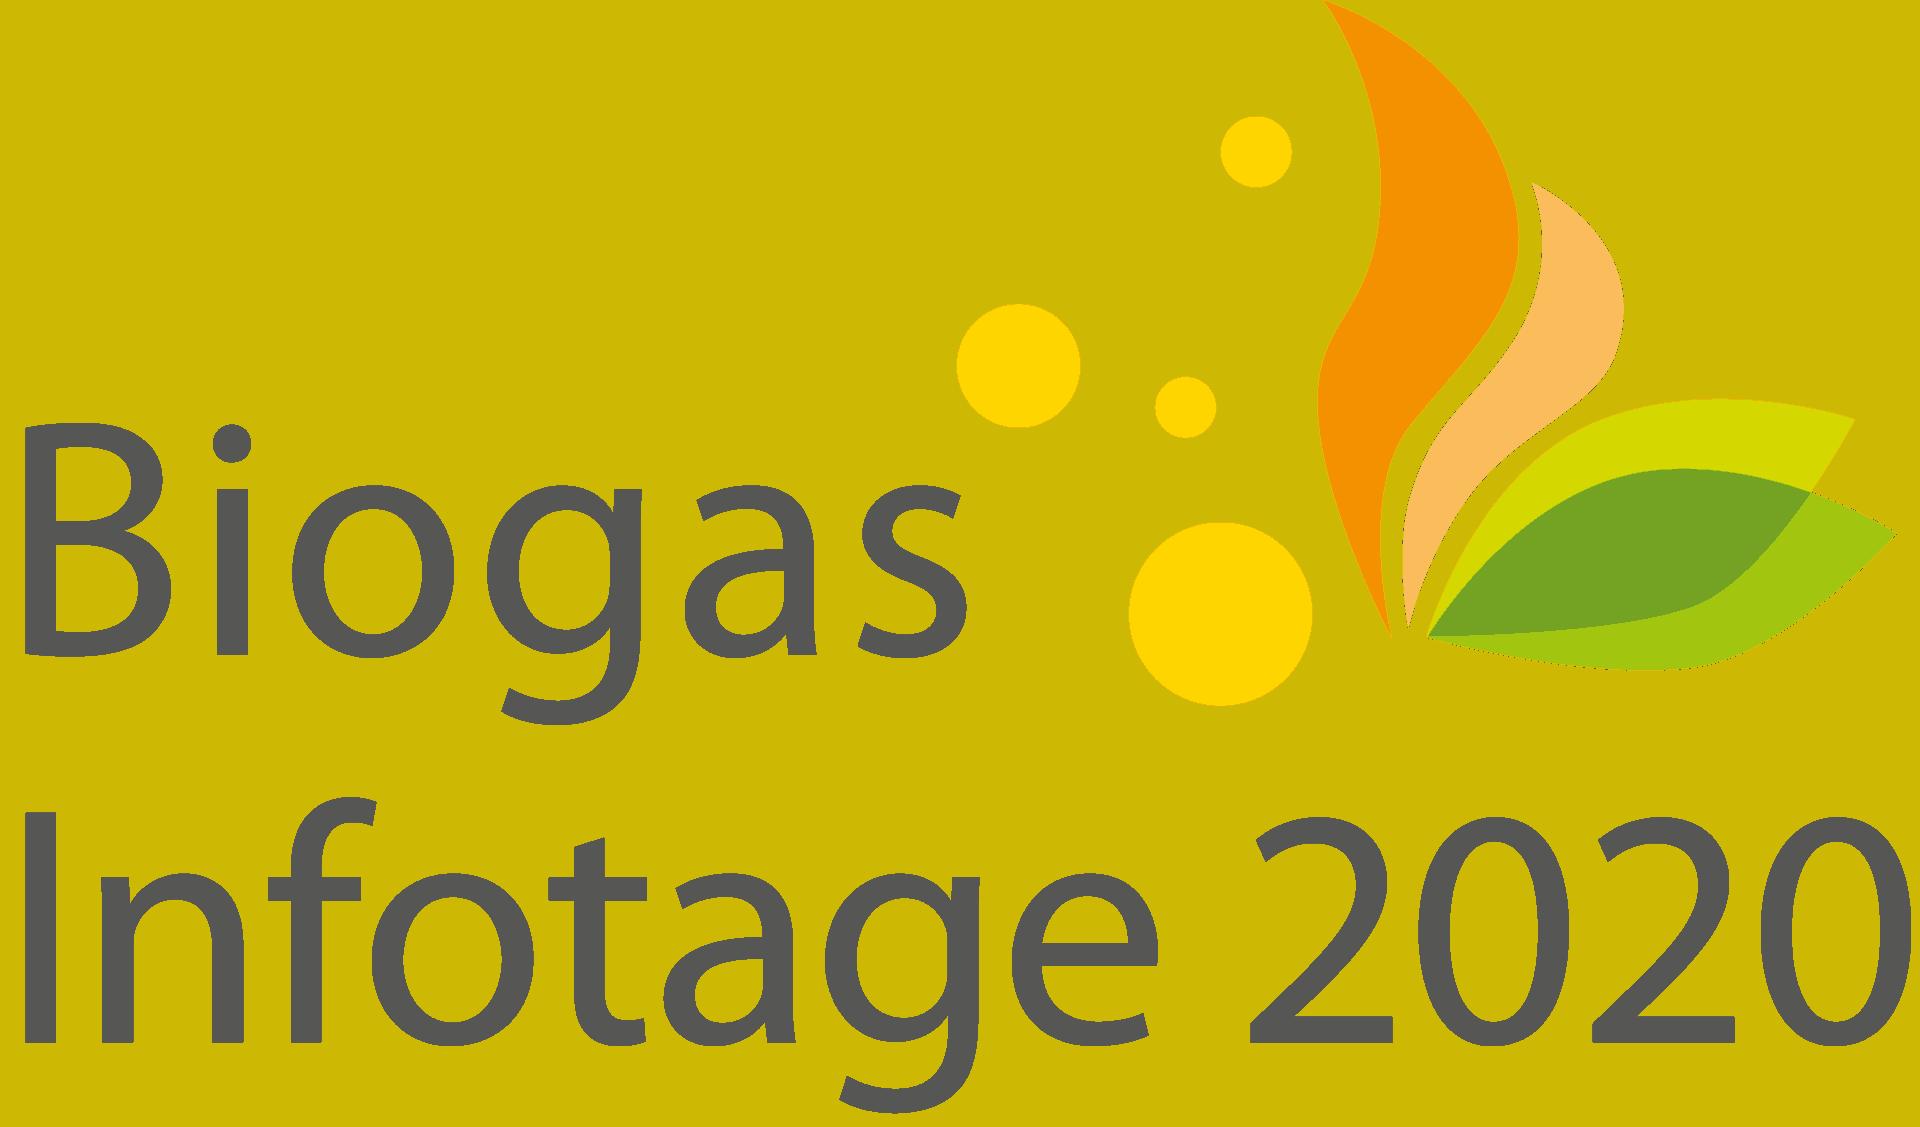 Biogas-Infotage-2020-